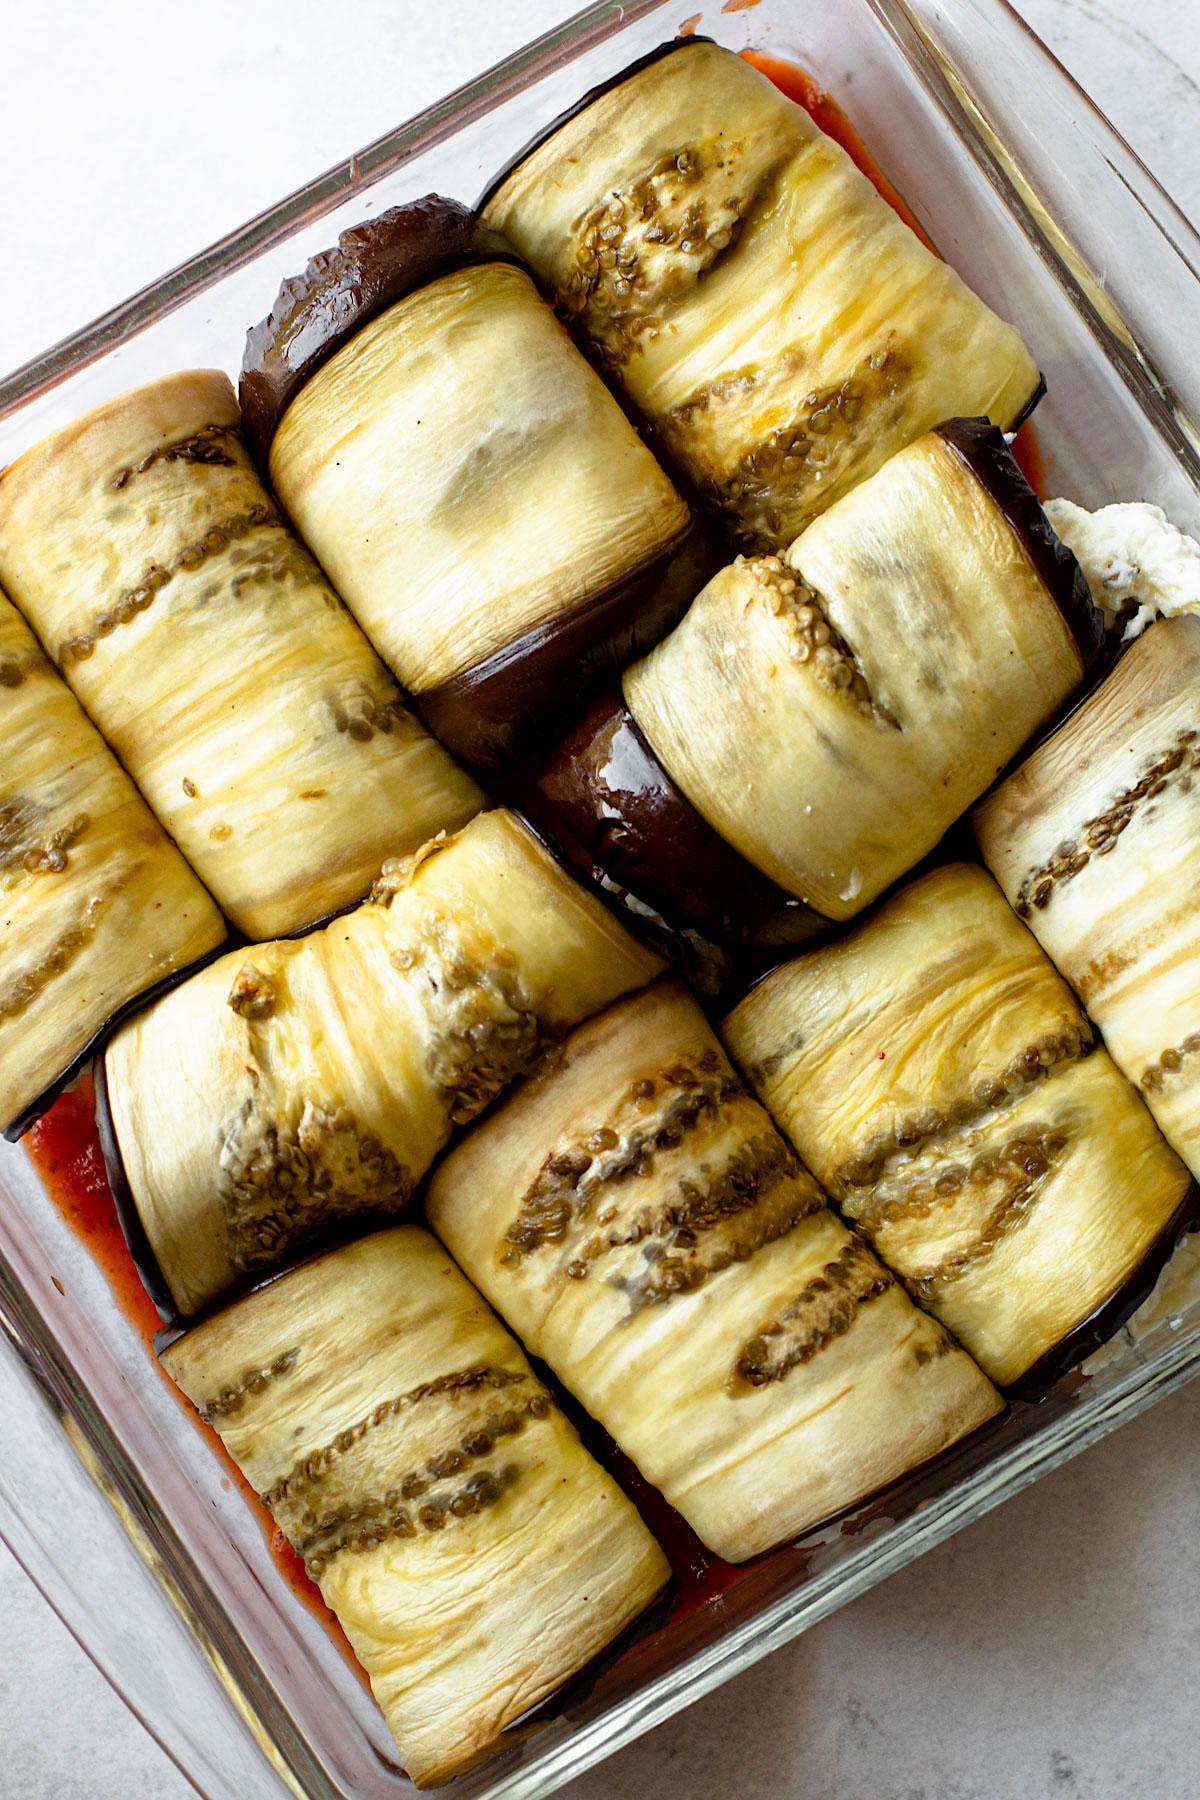 Eggplant rollatini inside of a baking dish.